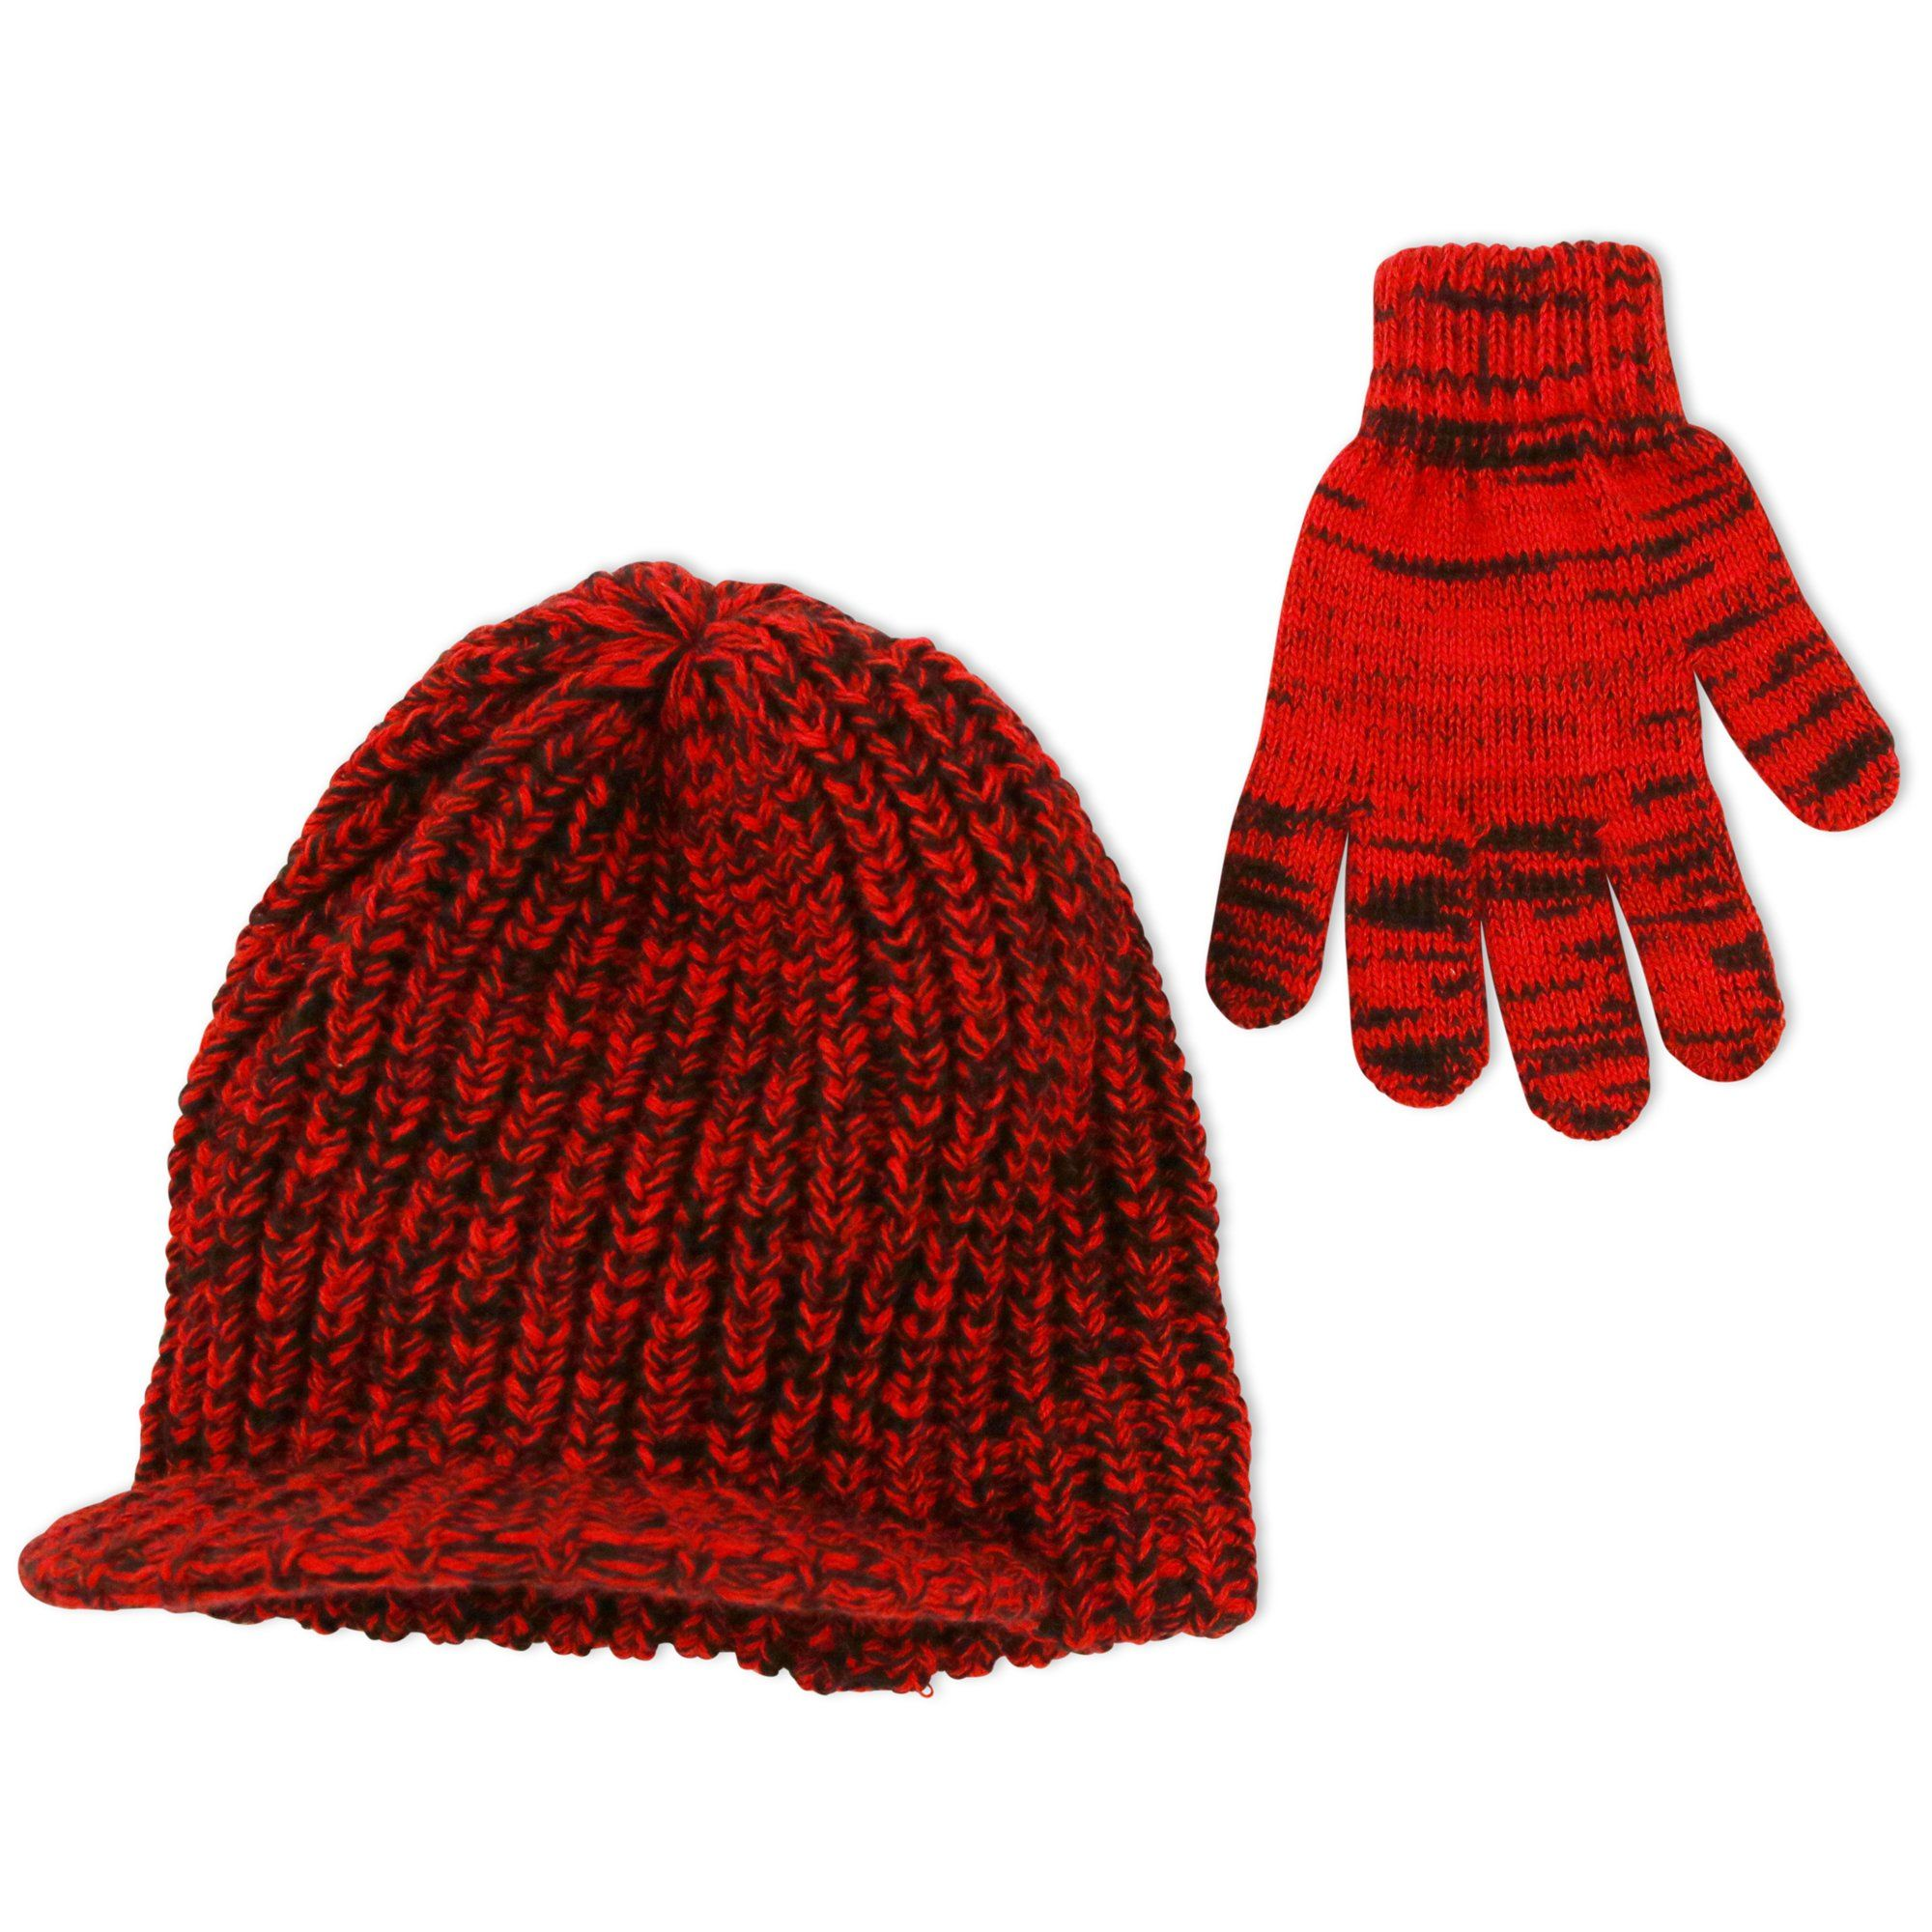 4a3cfc96d43 ABG Accessories Big Boys Marled Knit Radar Cap with Matching Magic Gloves